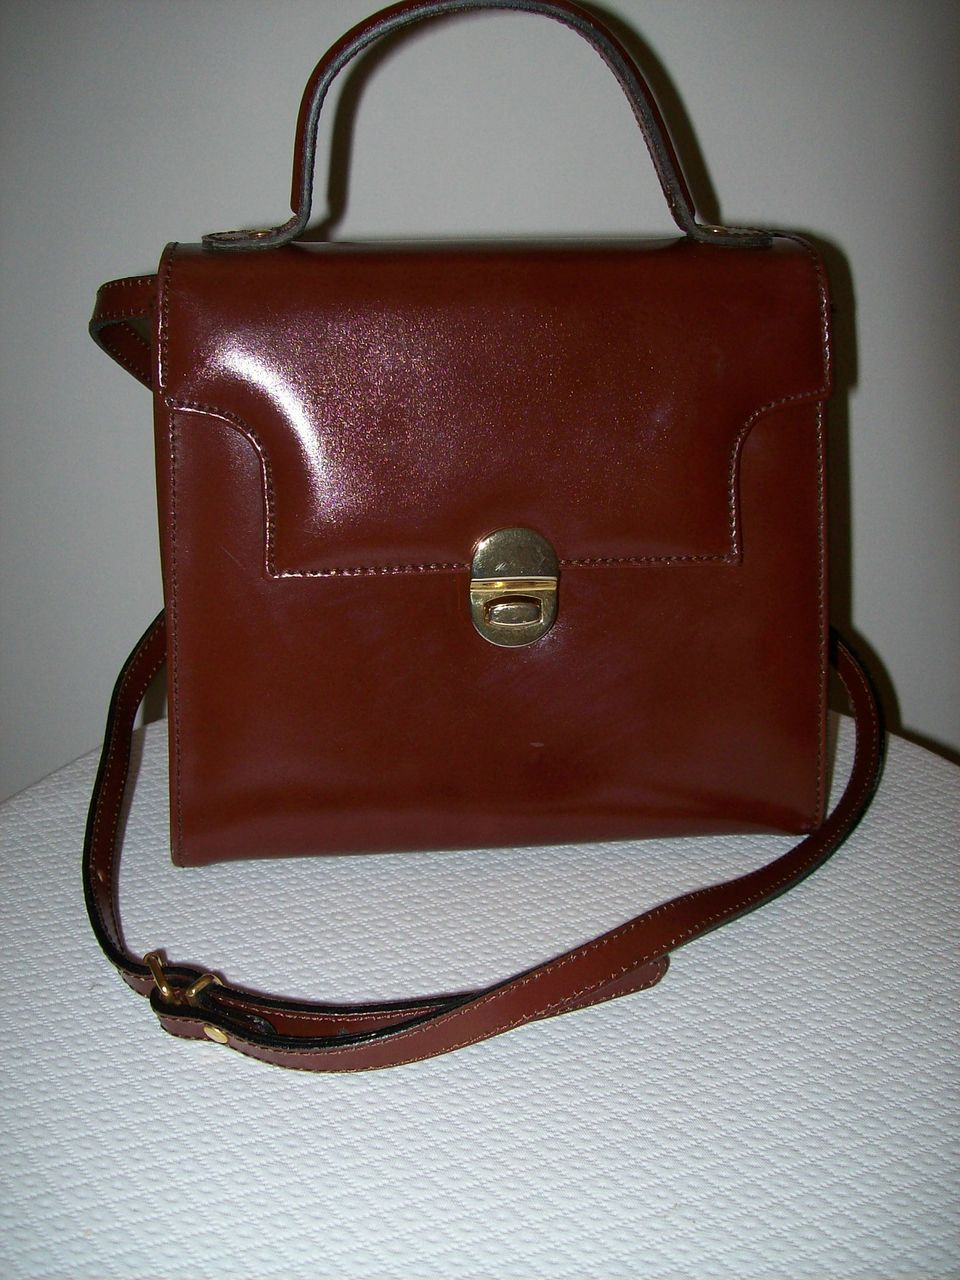 Item ID: 251 leather handbag In Shop Backroom